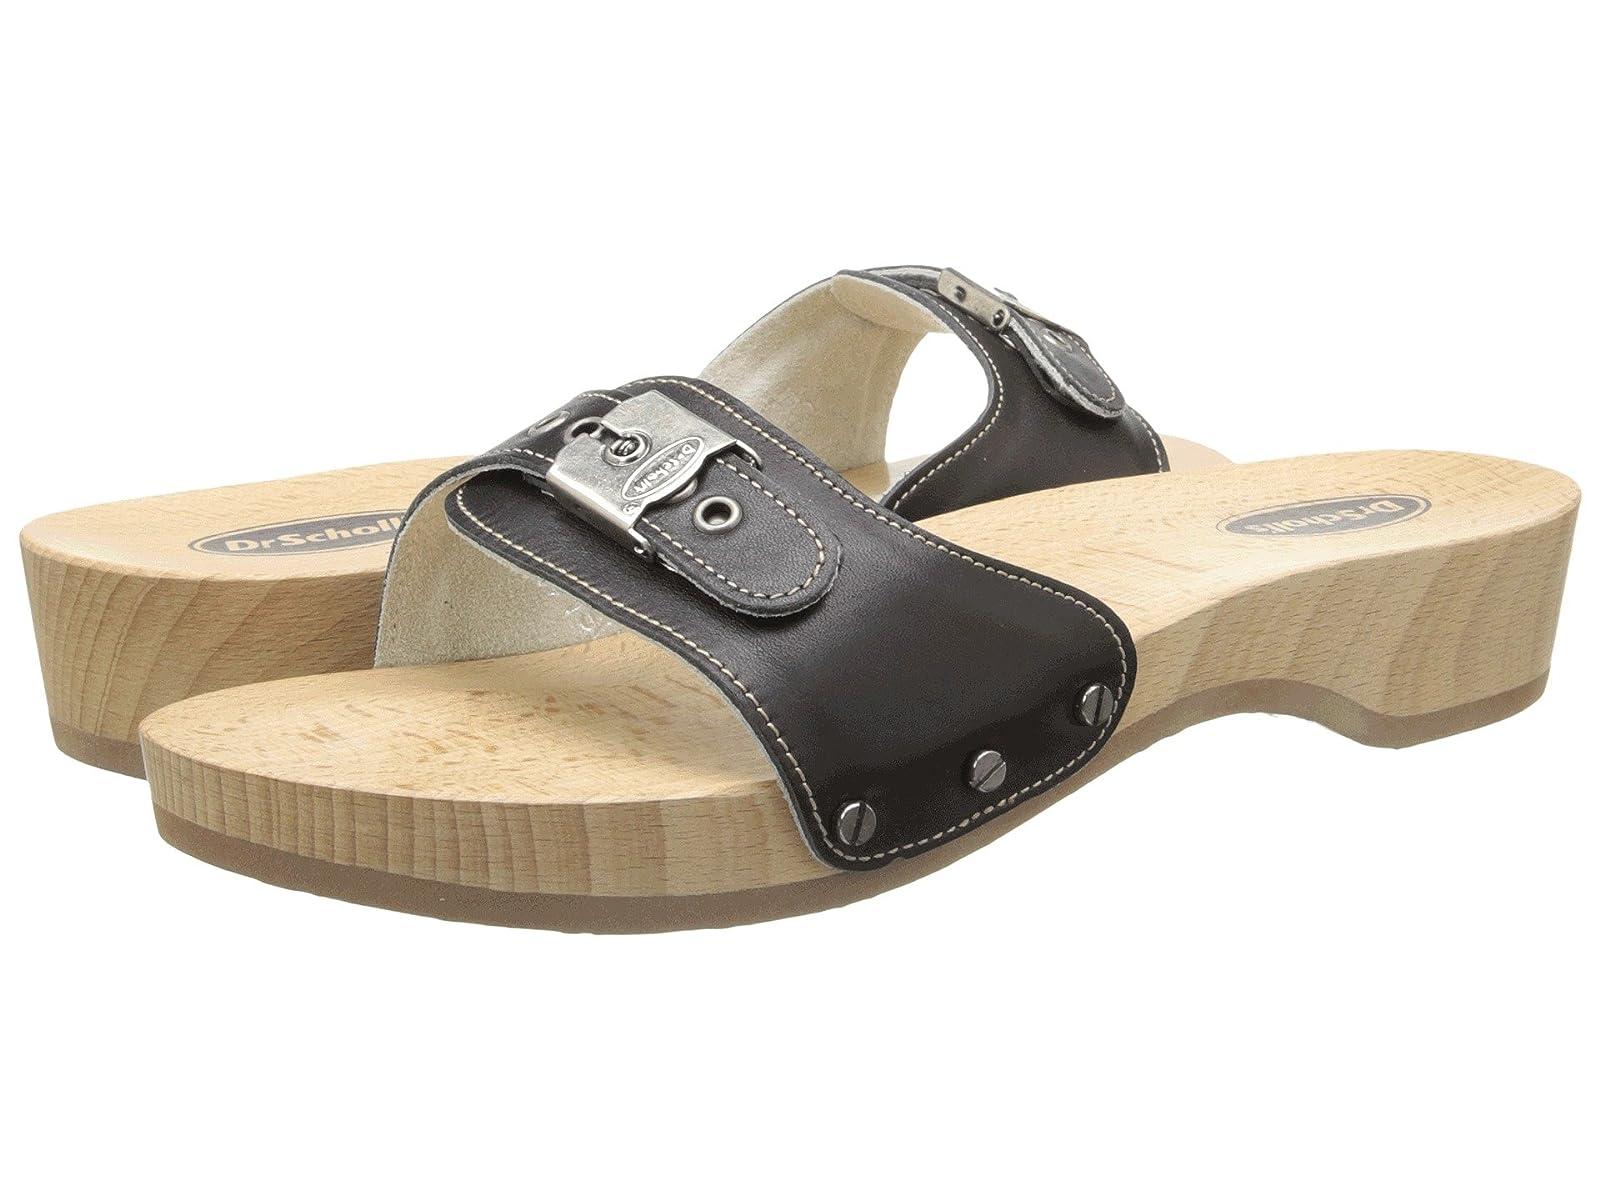 Dr. Scholl's Original - Original CollectionComfortable and distinctive shoes